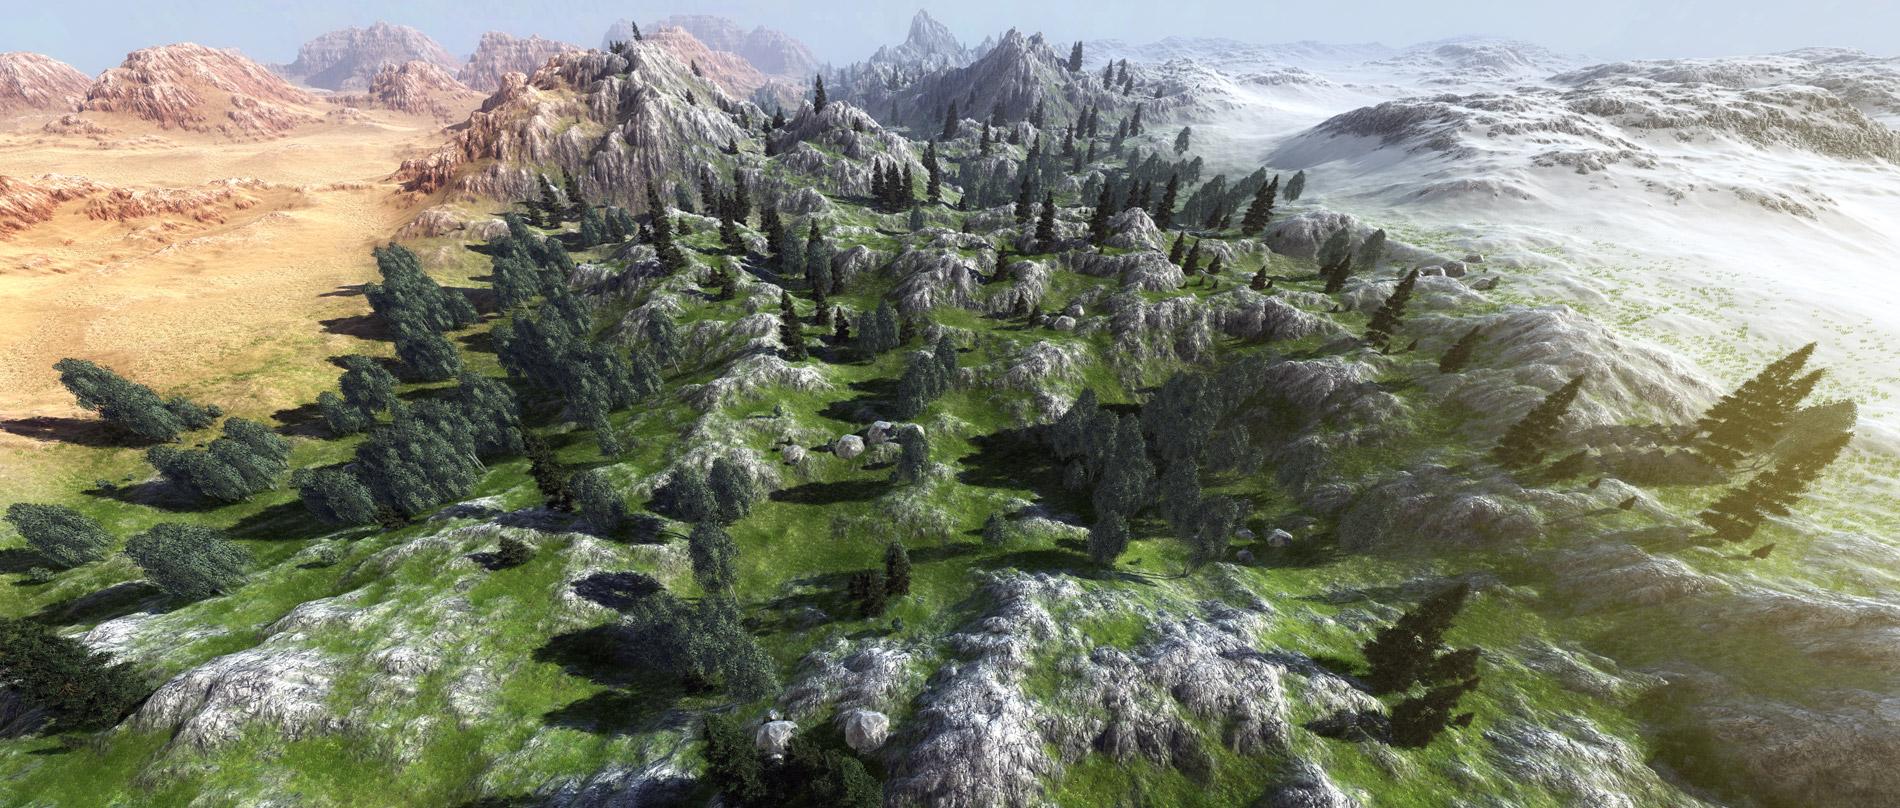 Biomes2.jpg